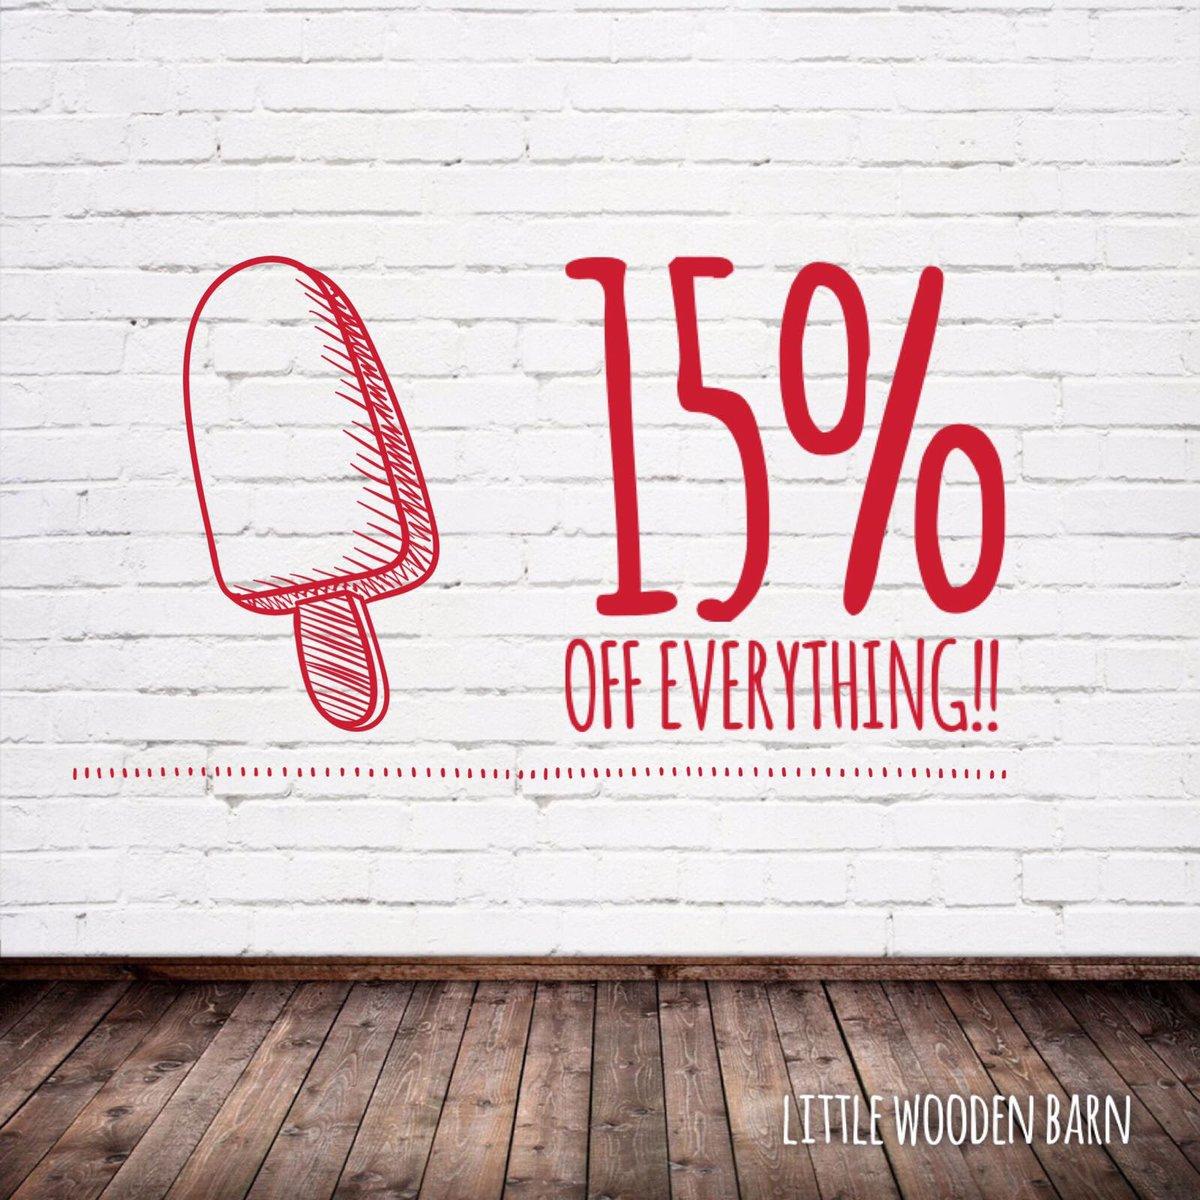 Summer Sale Now On  15% off all orders until 30th August #handpainted #personalised #keepsakebox   https://www. etsy.com/uk/shop/Little WoodenBarn &nbsp; … <br>http://pic.twitter.com/qBTl7nN3tf